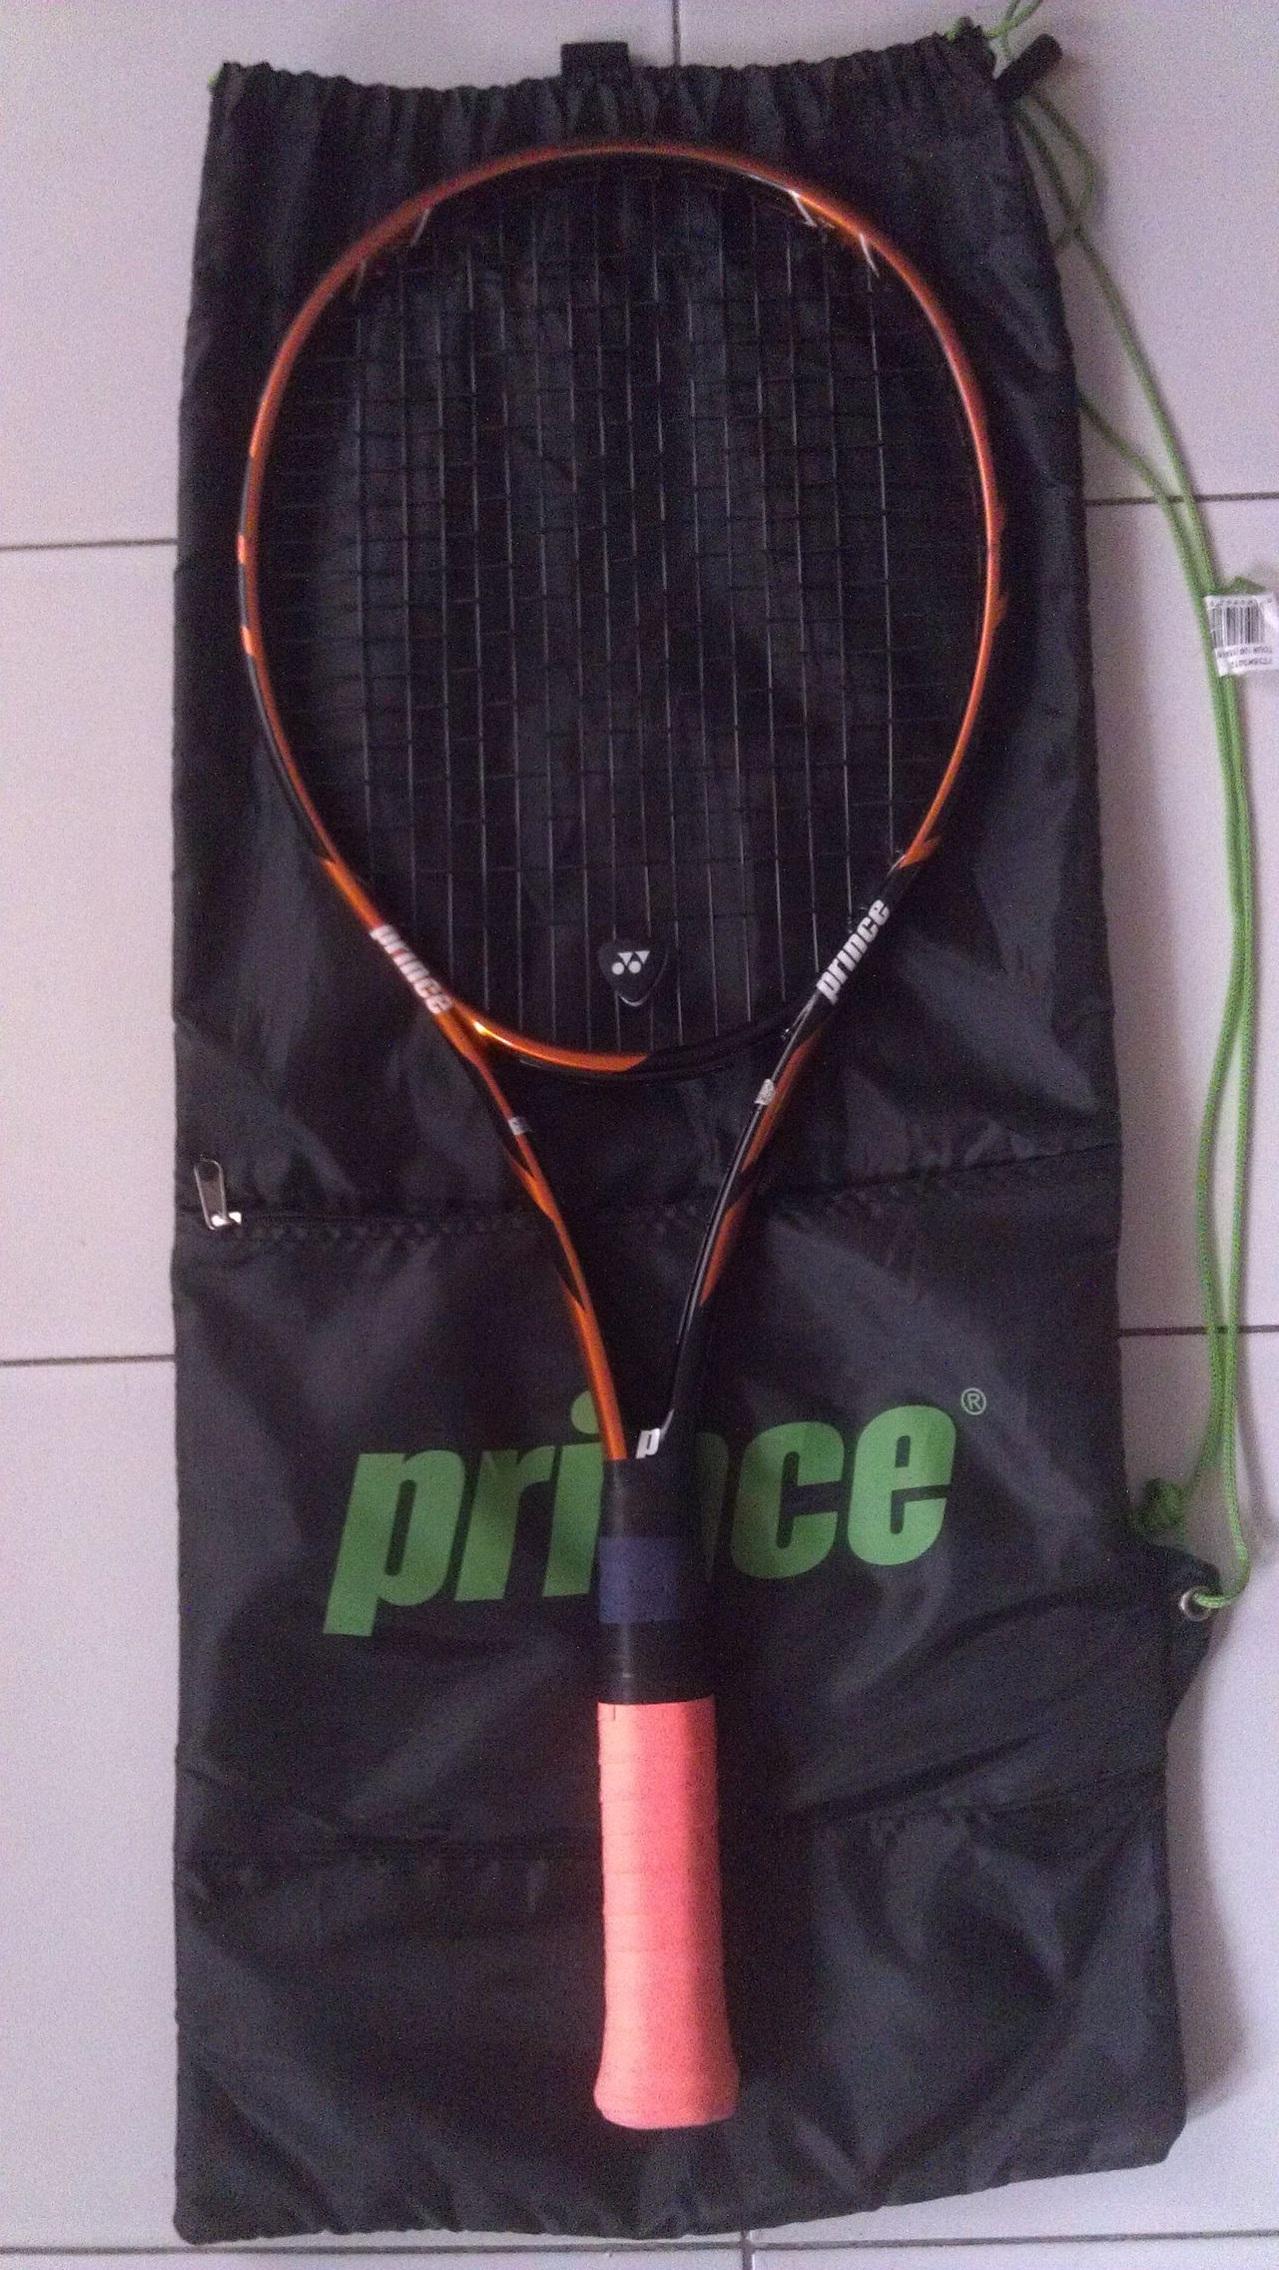 Raket Tennis Tenis Prince Tour 100 (16x18) David Ferrer Second Mint